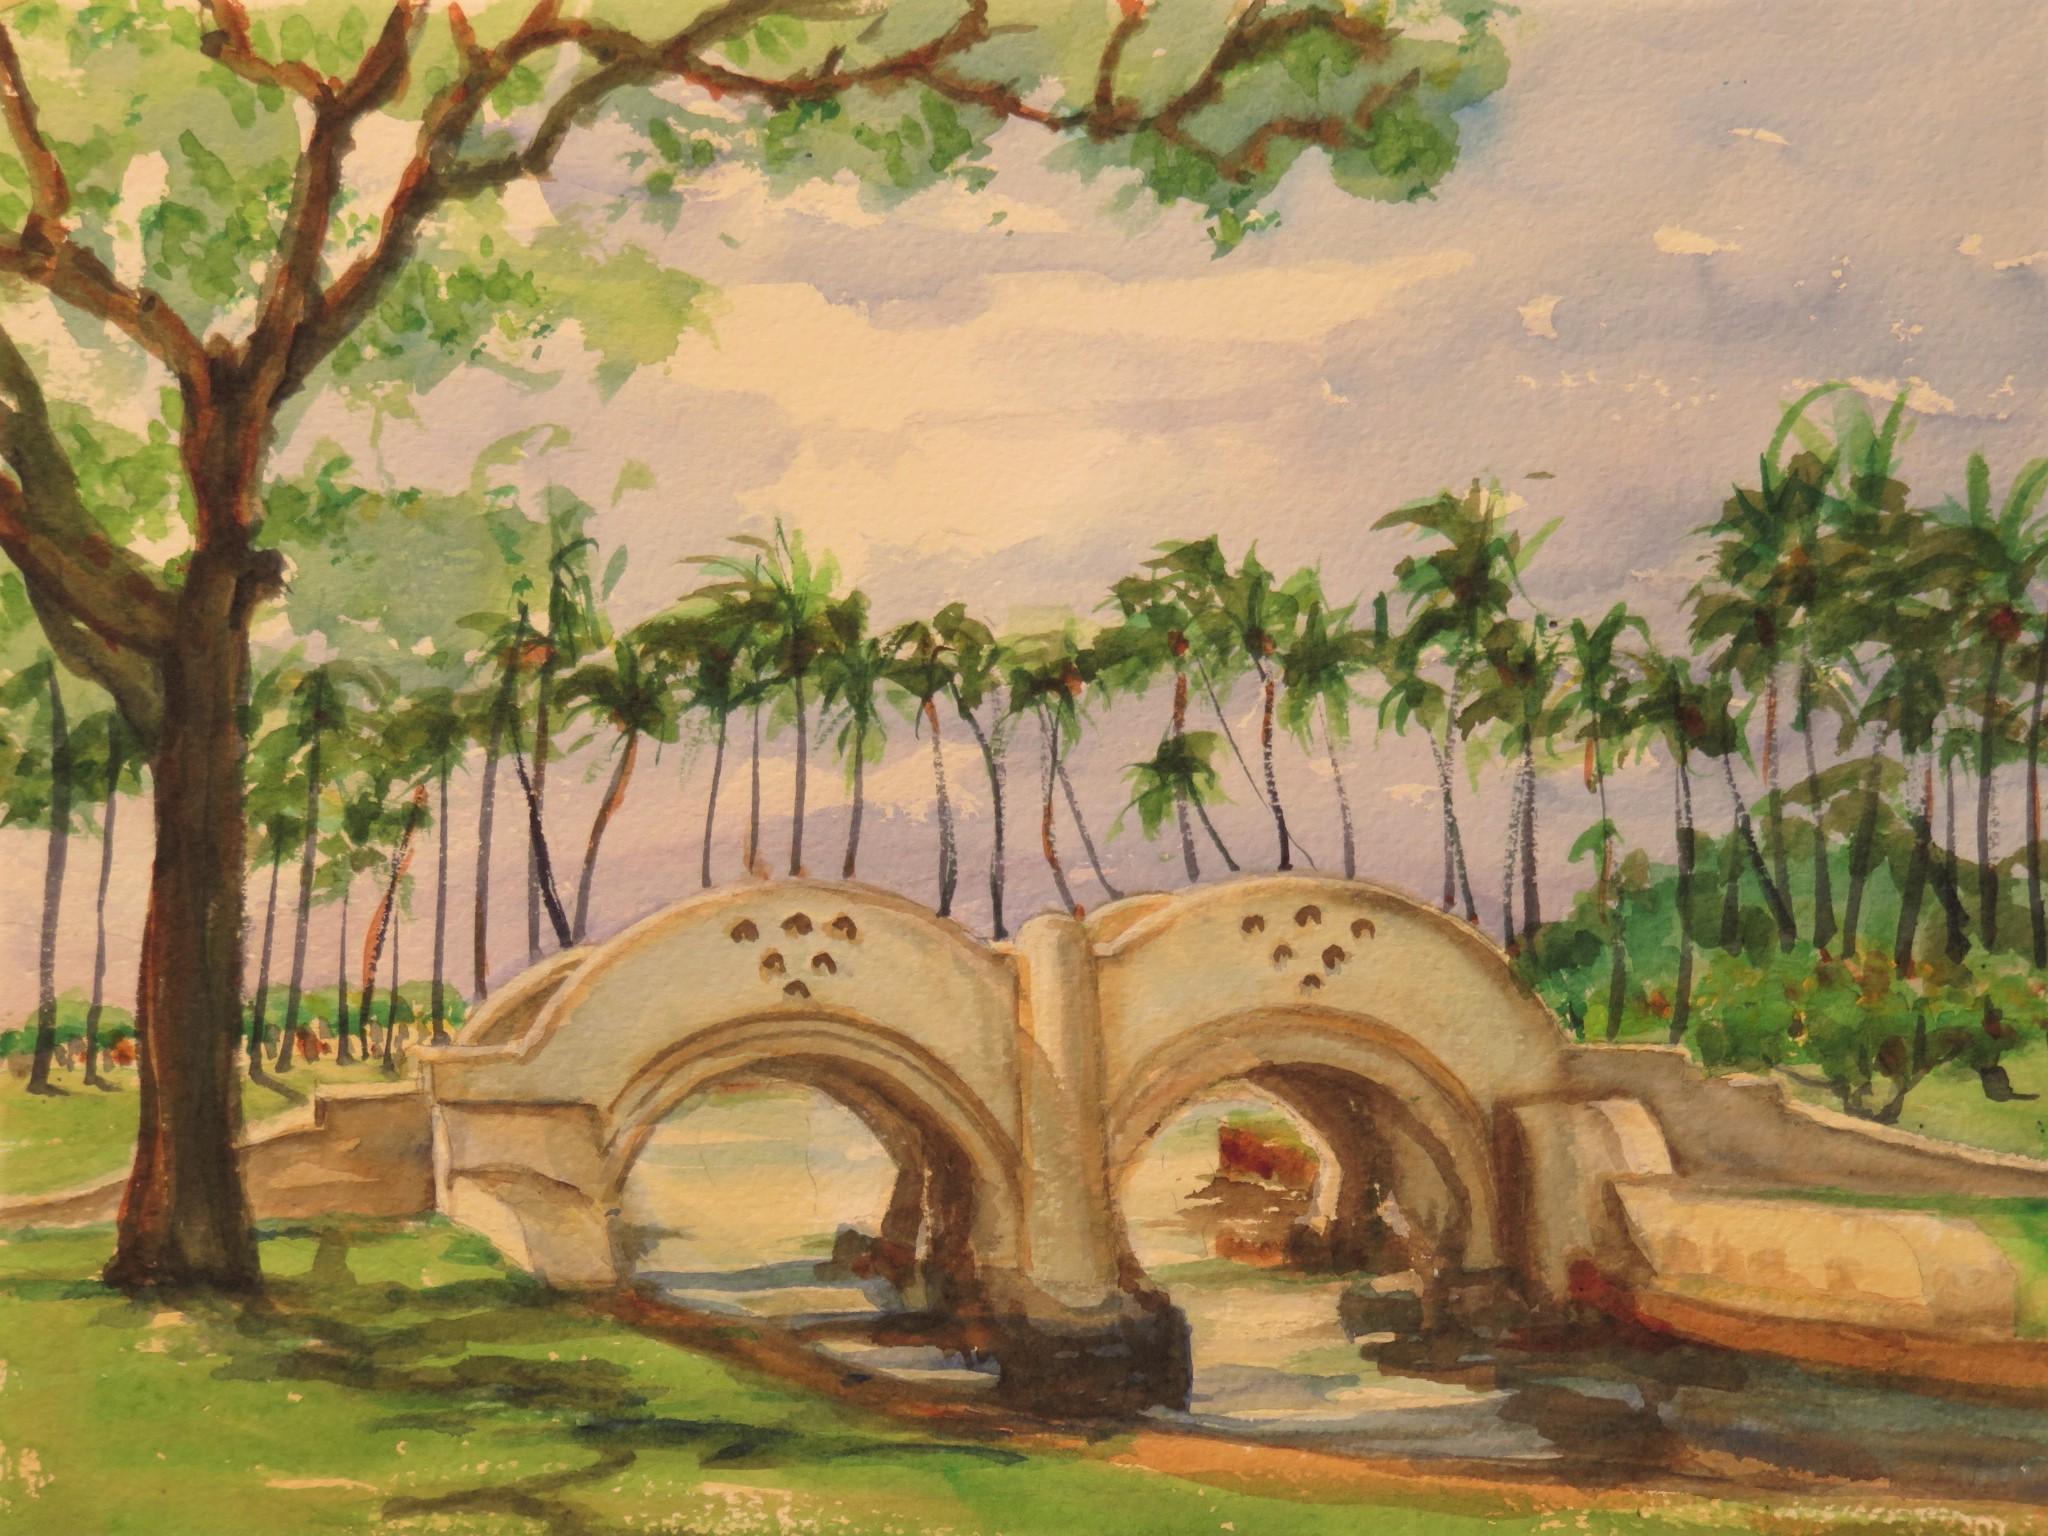 Flora Ling Bridle Path Bridge In Ala Moana Park 2020 Courtesy Historic Hawaii Foundation